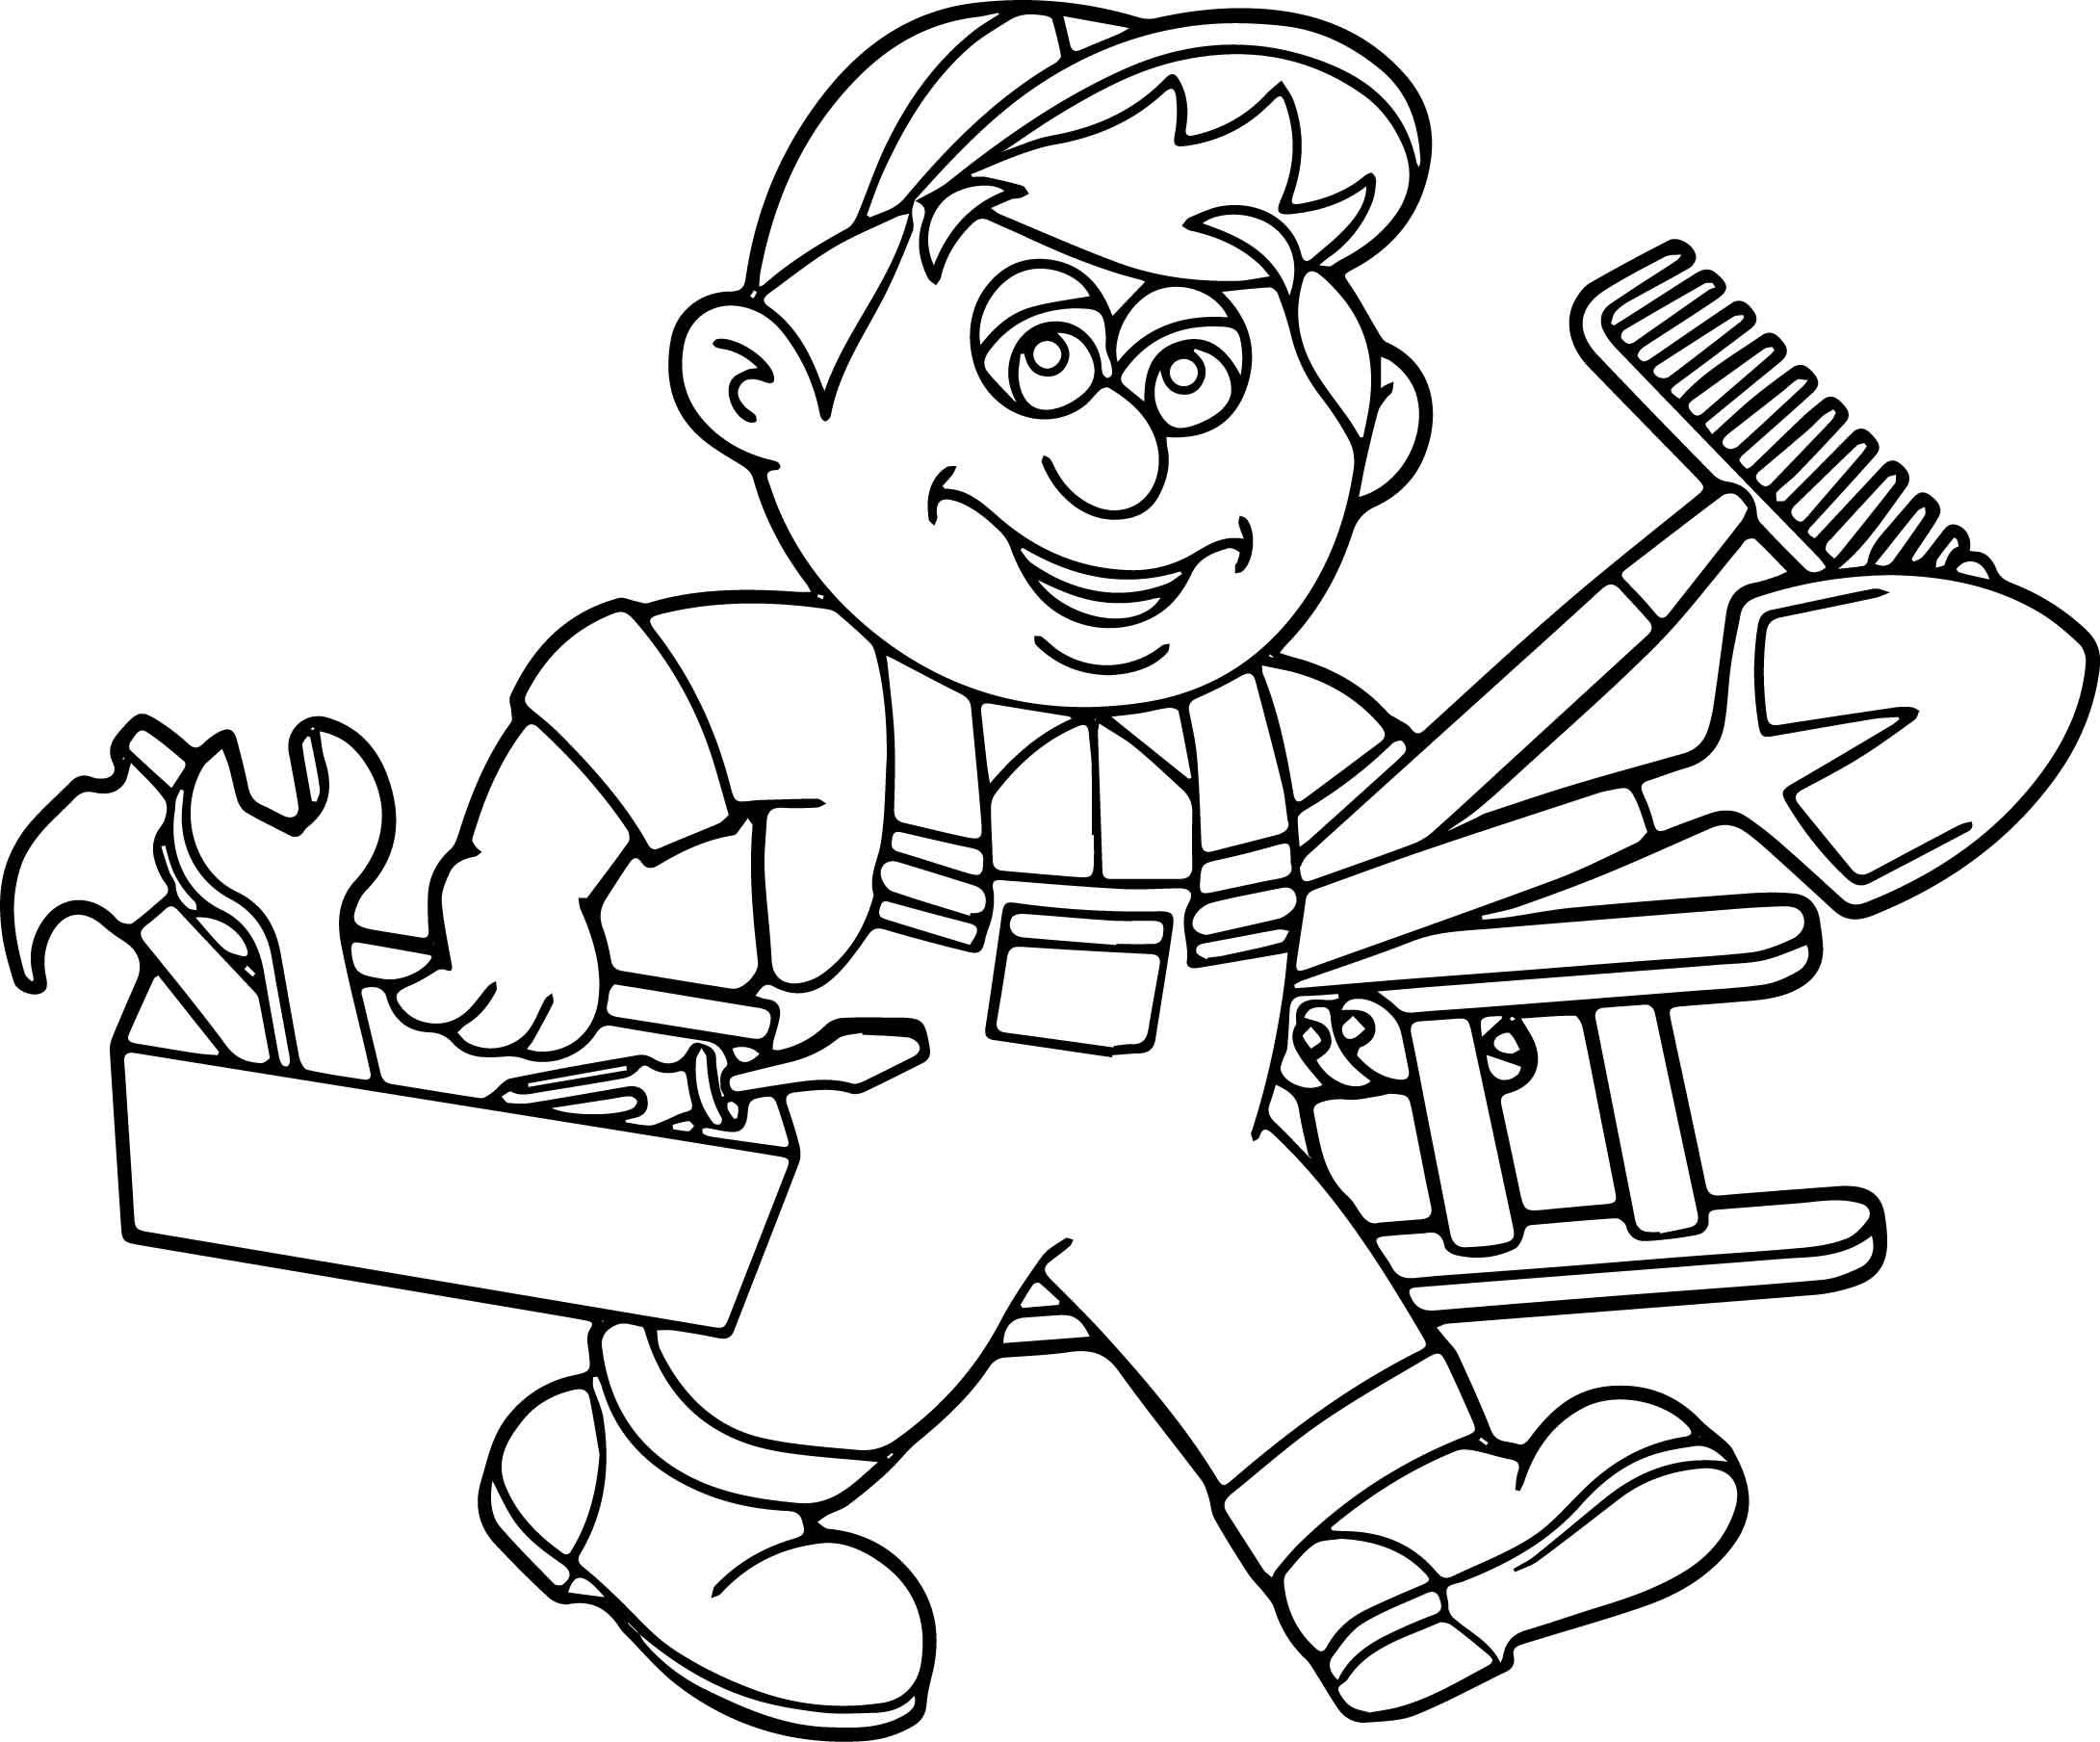 Carpenter Handyman Services Toolbox Coloring Page